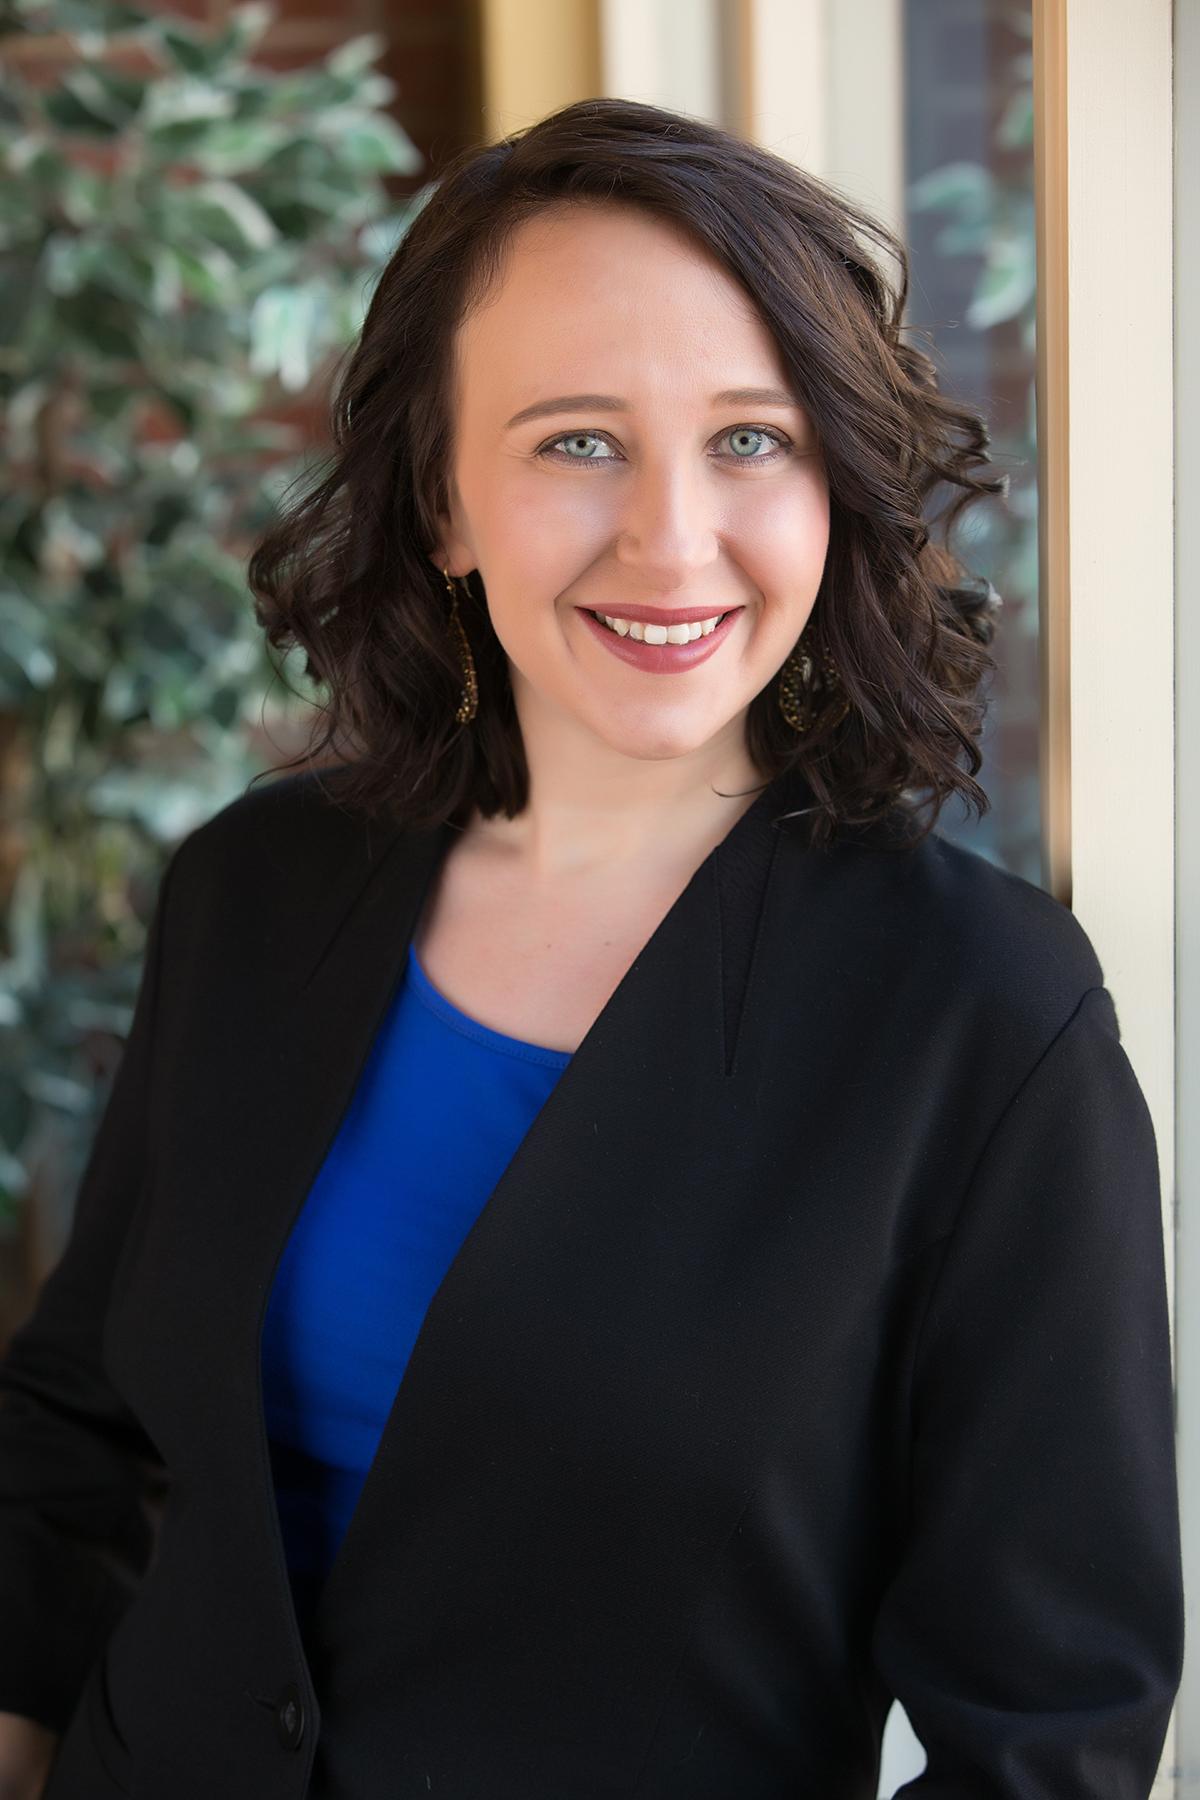 Kari Karp, LPC - Certified Emotionally Focused Therapist